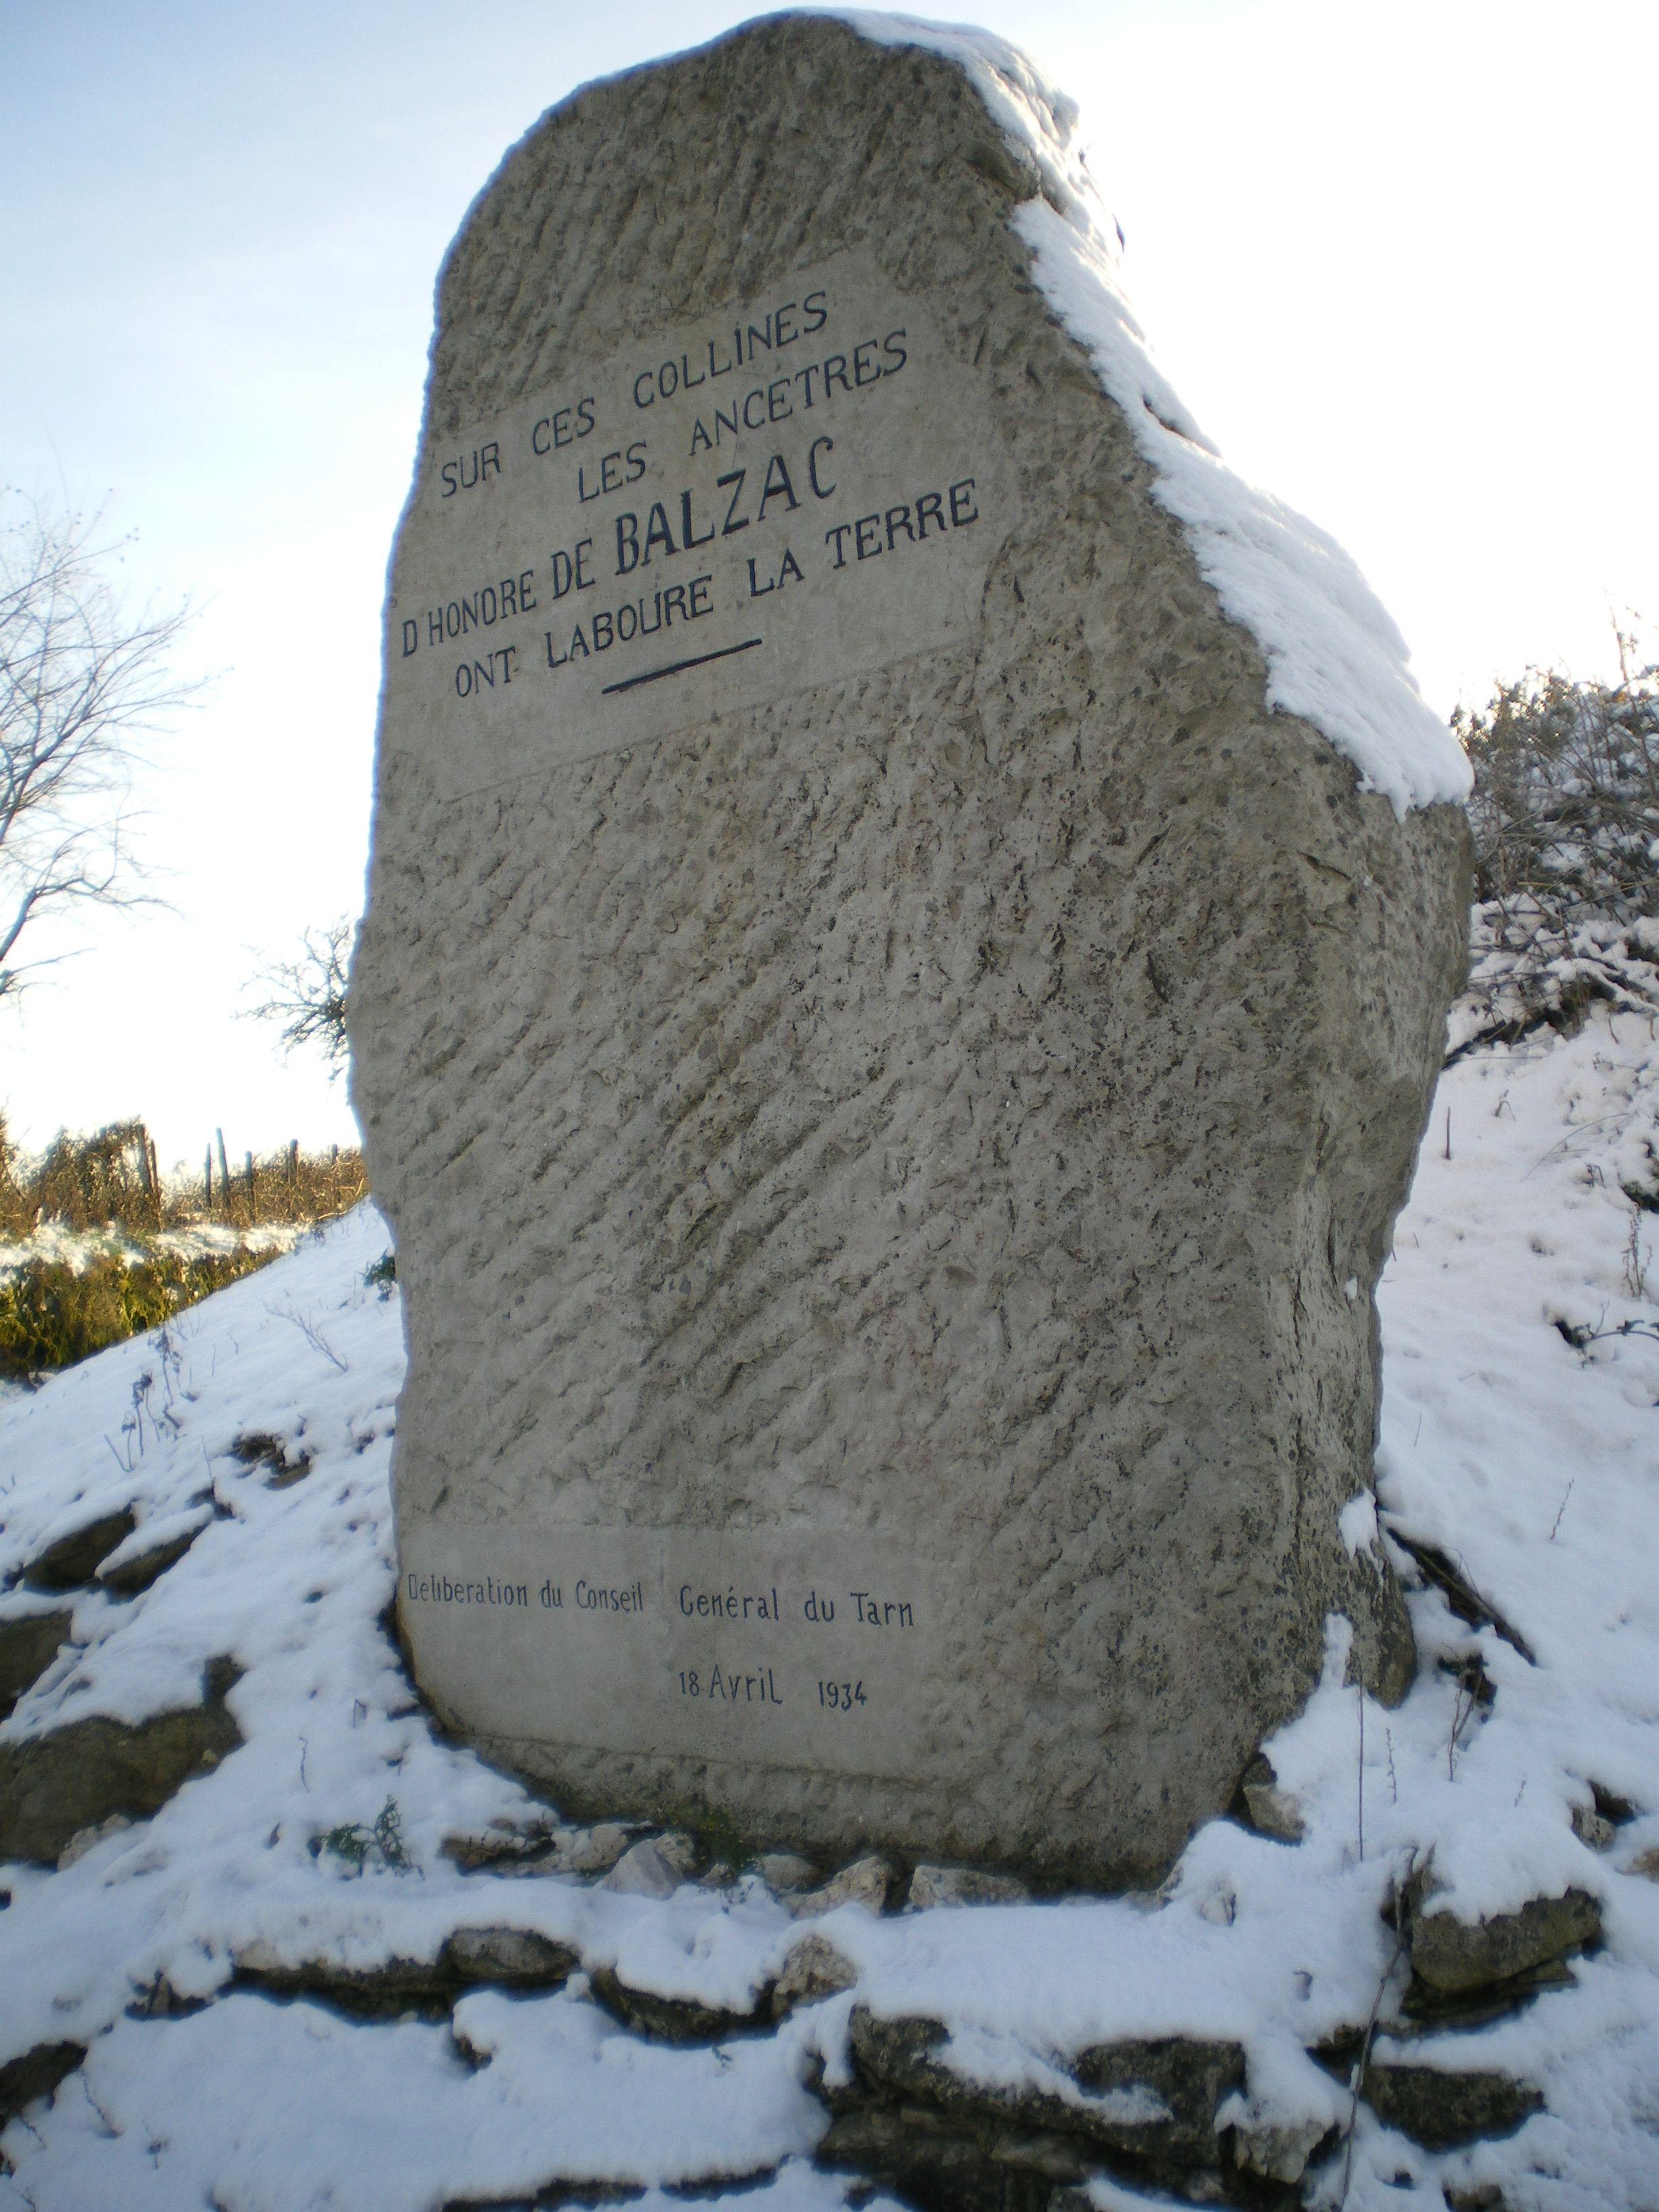 pierre balzac p.8-9